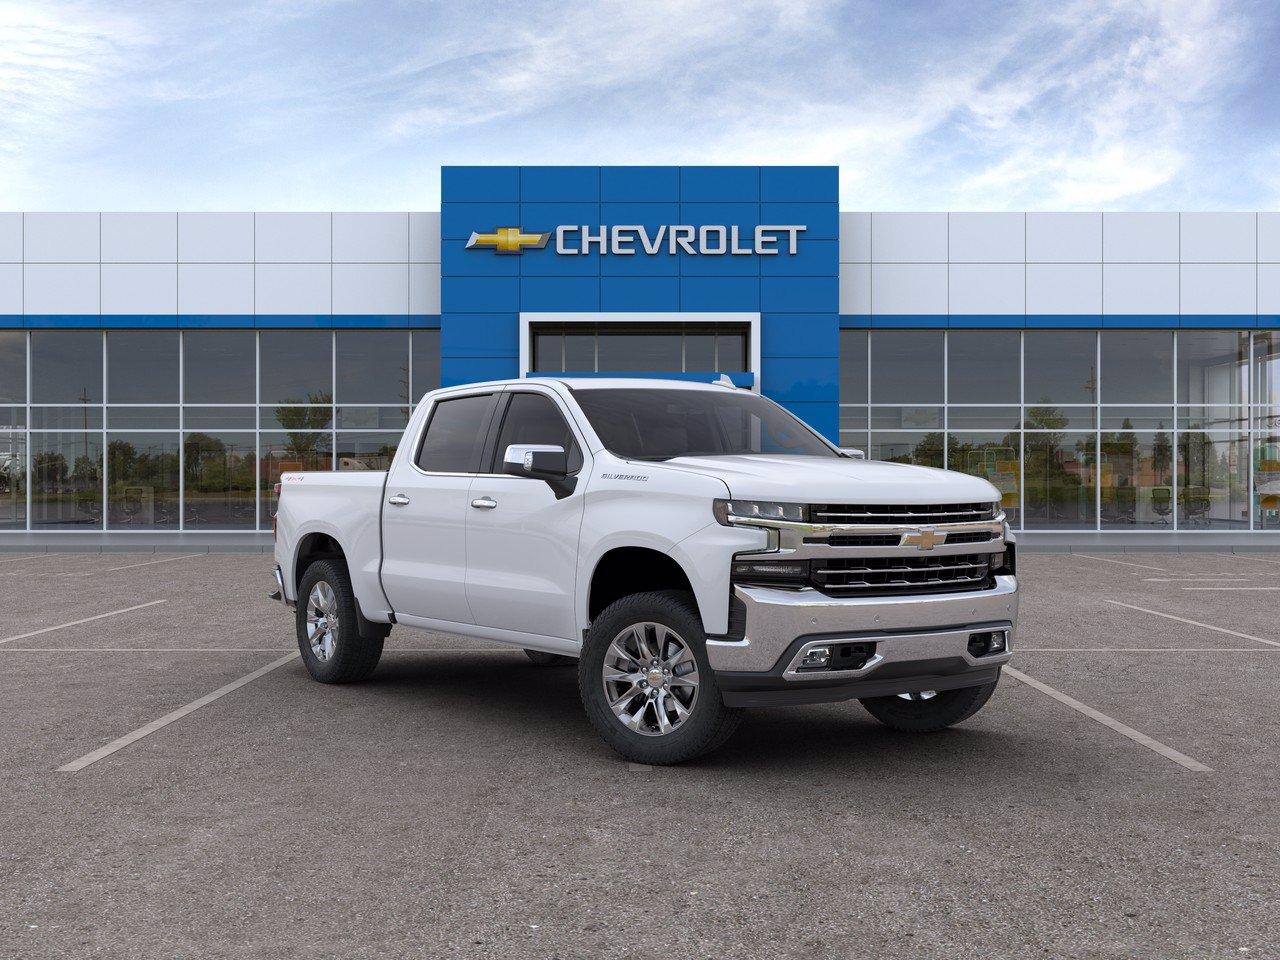 2020 Chevrolet Silverado 1500 Crew Cab 4x4, Pickup #C201706 - photo 1